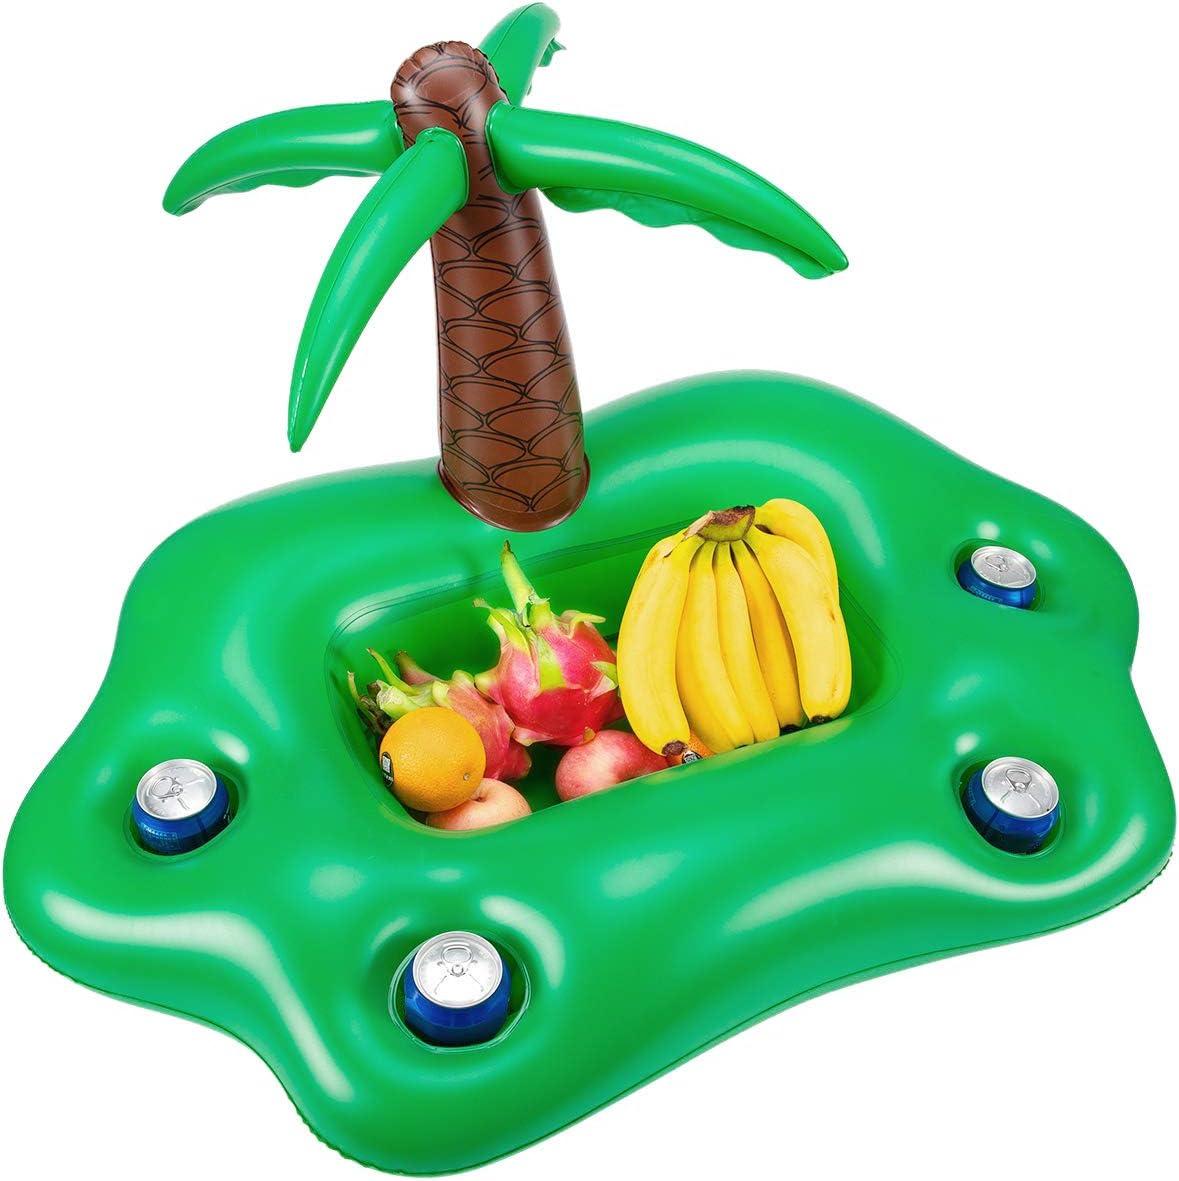 TOOGOO Summer Piscina Inflable Soporte para Vasos Fiesta Barra De Hielo Piscina Flotador Cerveza Enfriador De Bebidas PVC Bandeja Flotante Accesorios para Piscina De Playa - Verde